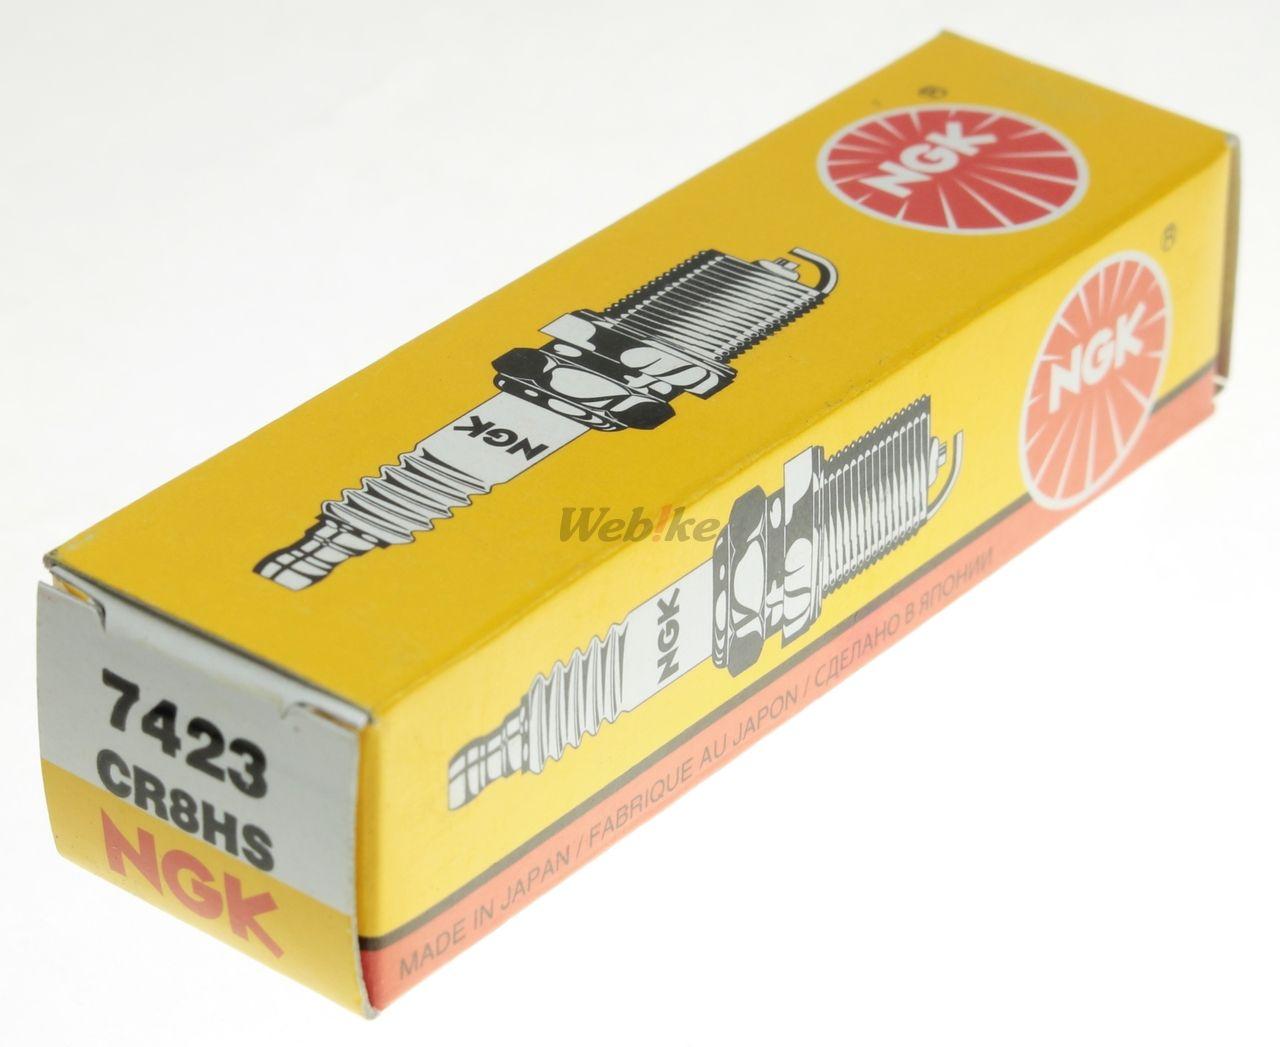 【NGK】標準型 火星塞 CR8HS 7423 - 「Webike-摩托百貨」